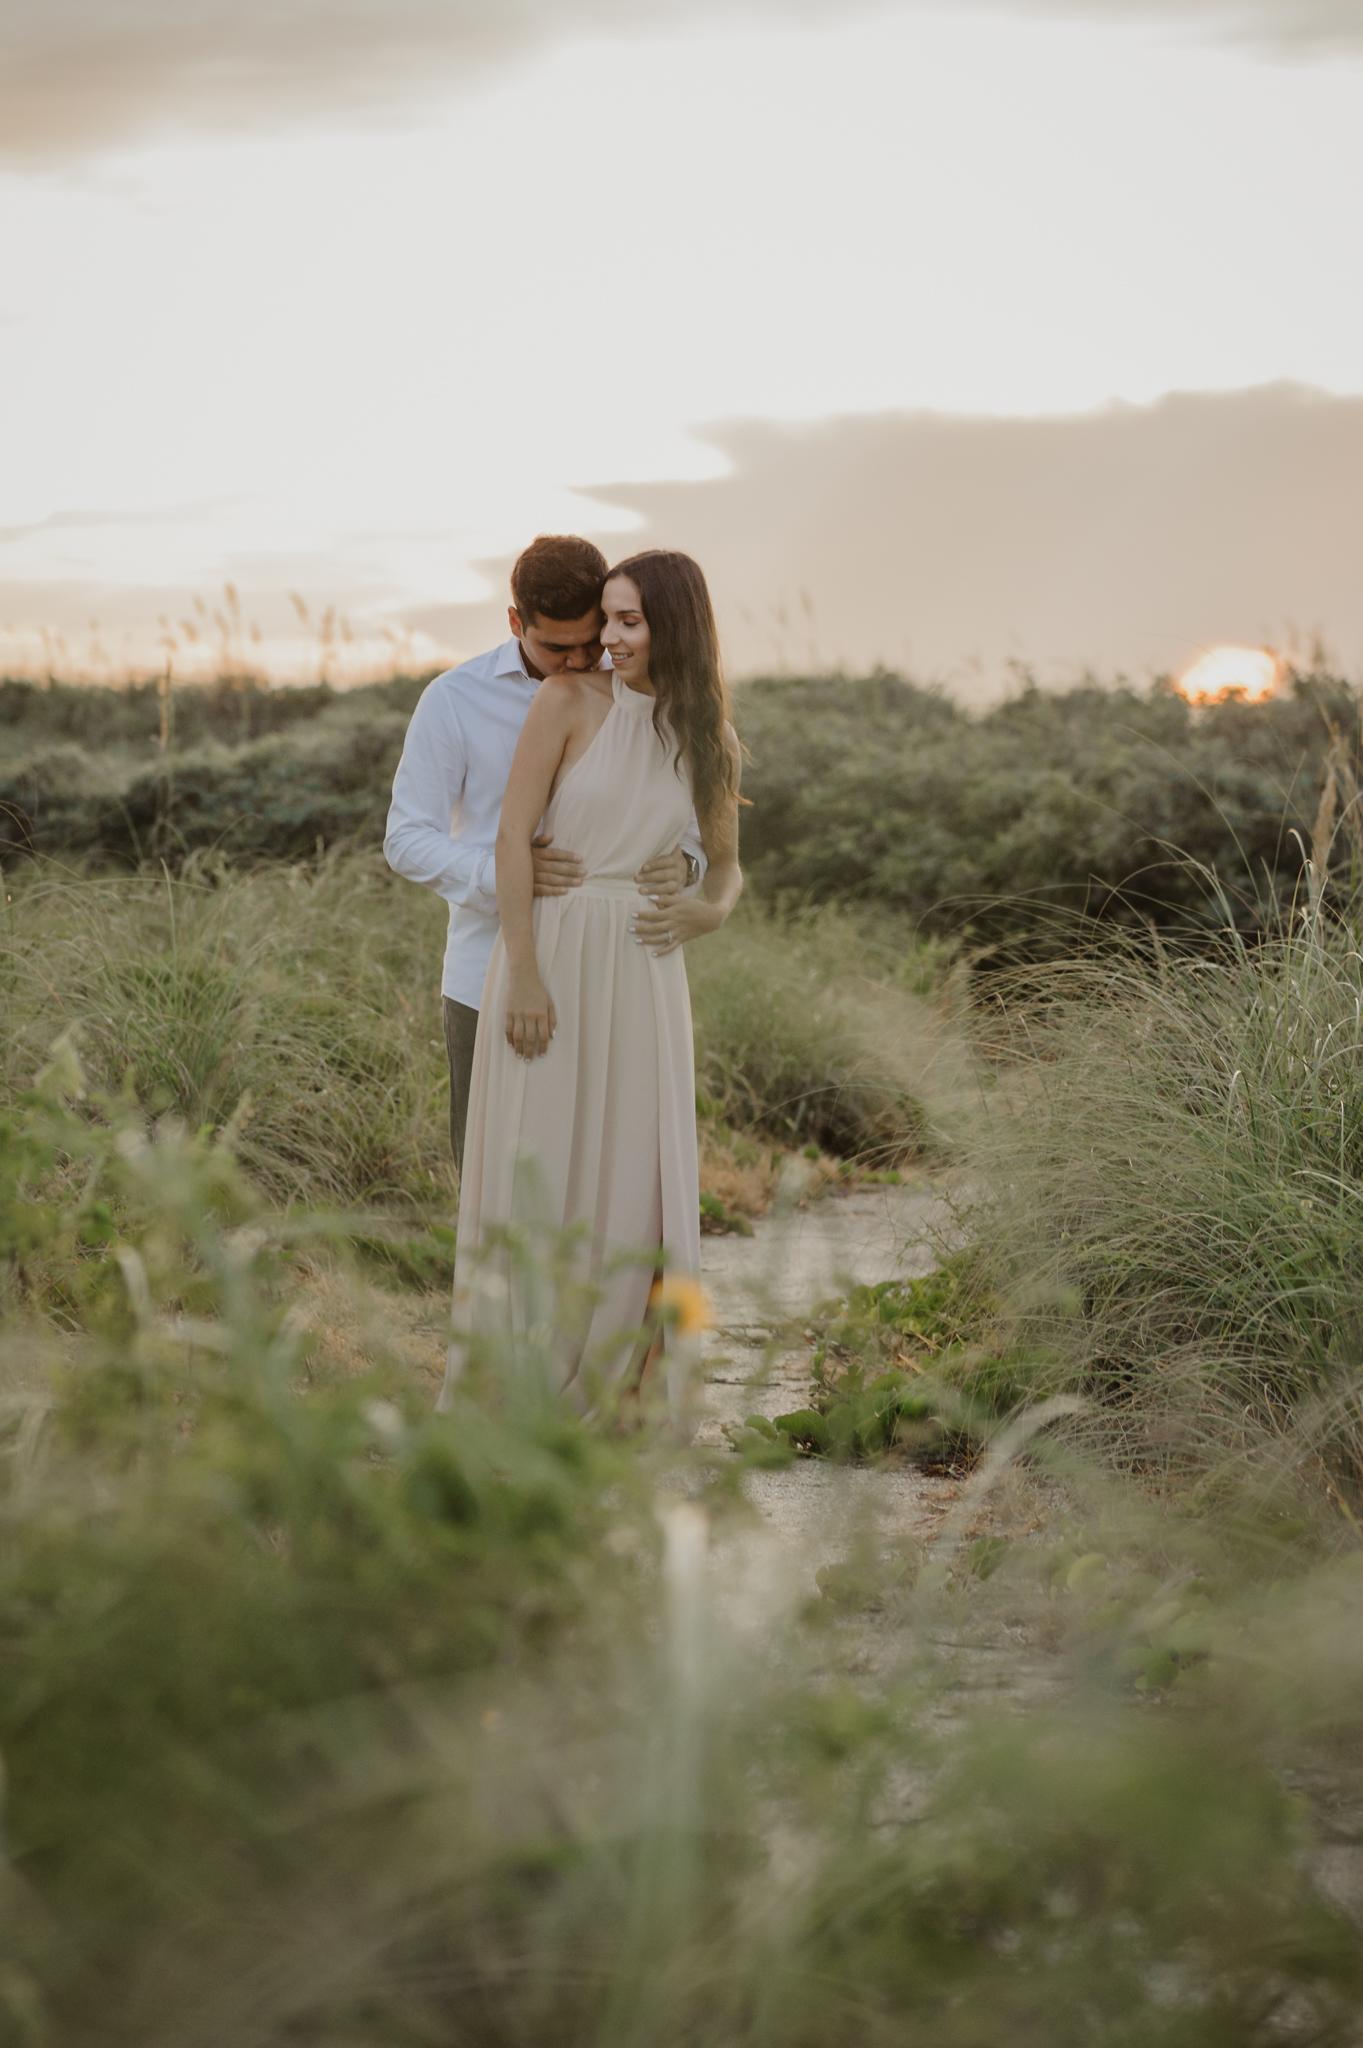 miami-beach-sunrise-engagement-vanessa-and-johnny-photography-video-1-10.jpg